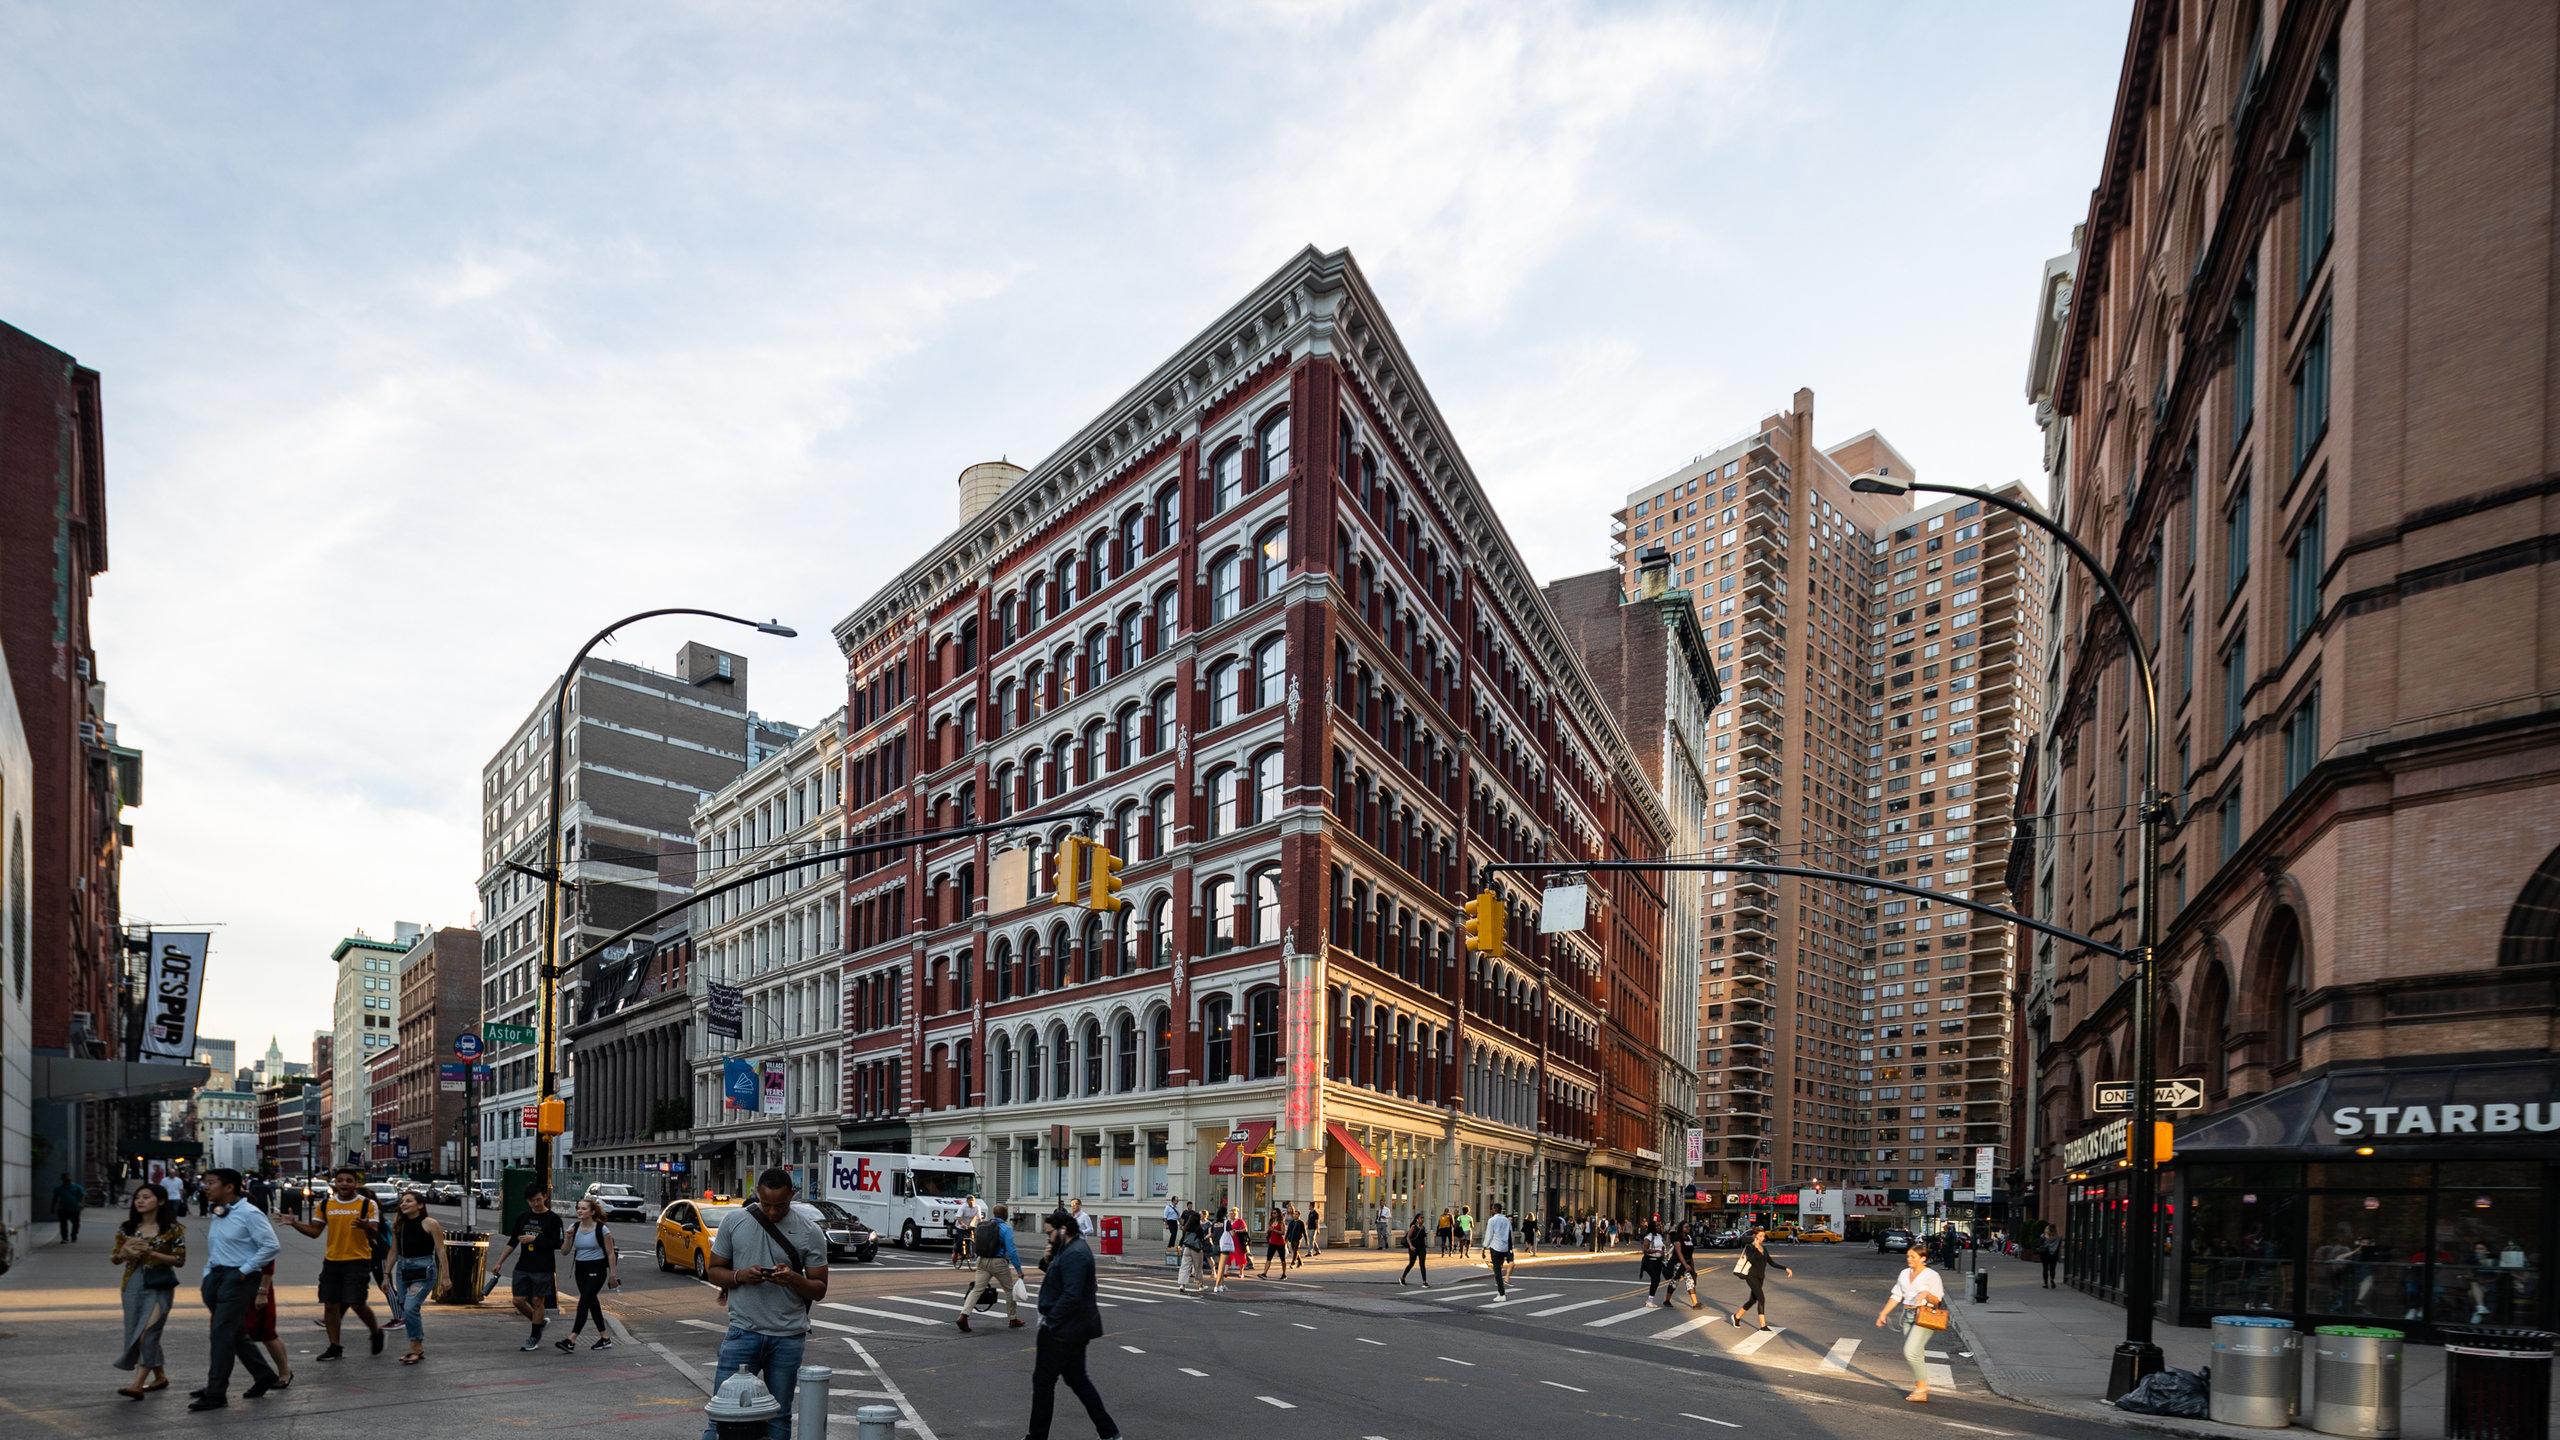 East Village, New York, New York, USA